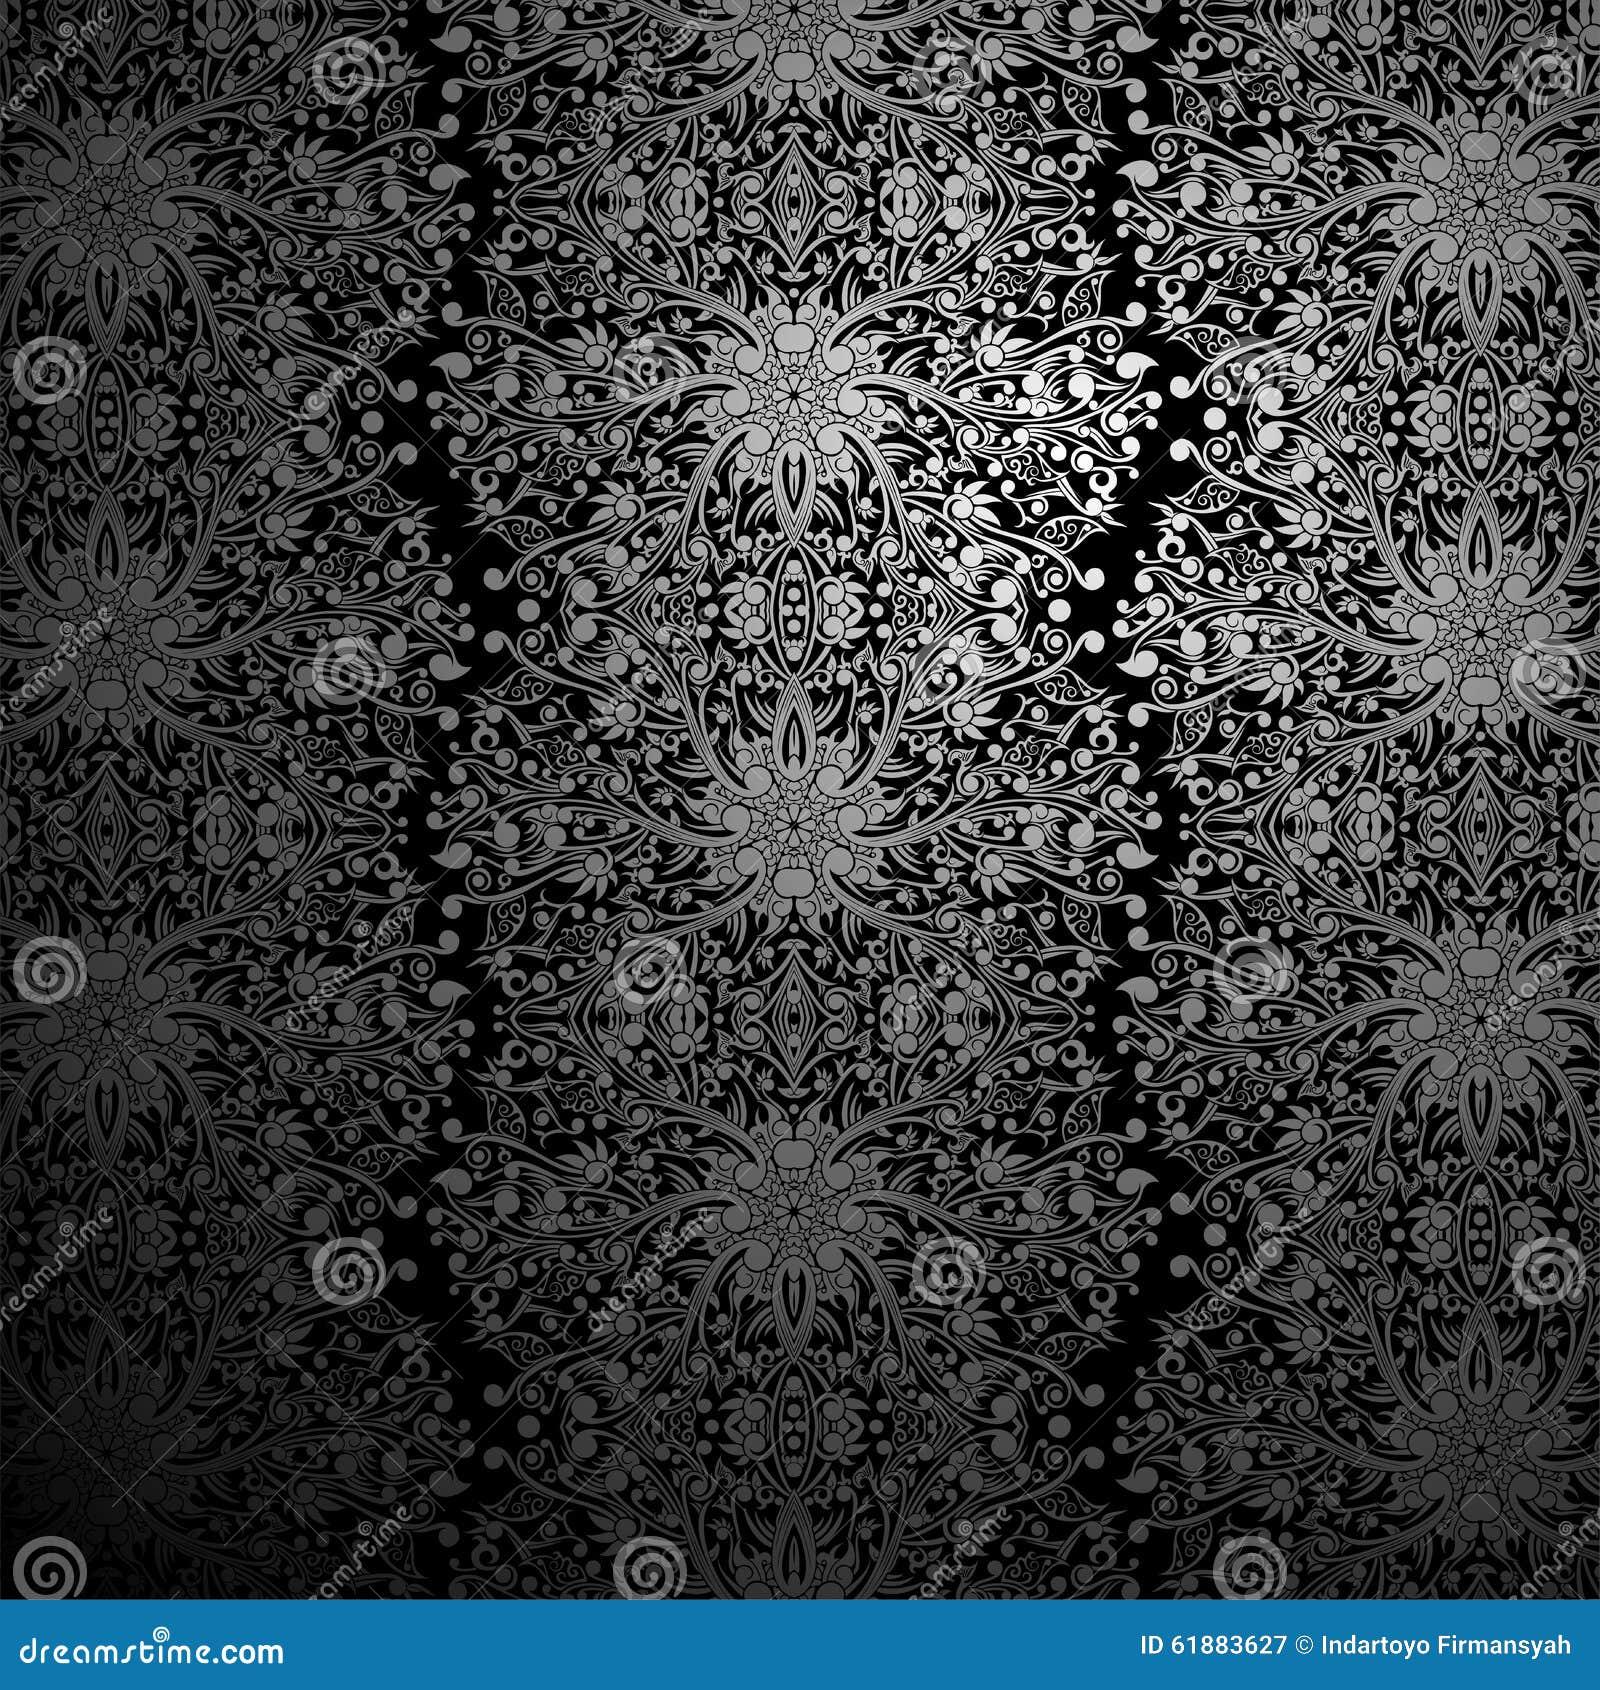 Wallpaper Black And Silver Swirl Abstract Batik Stock